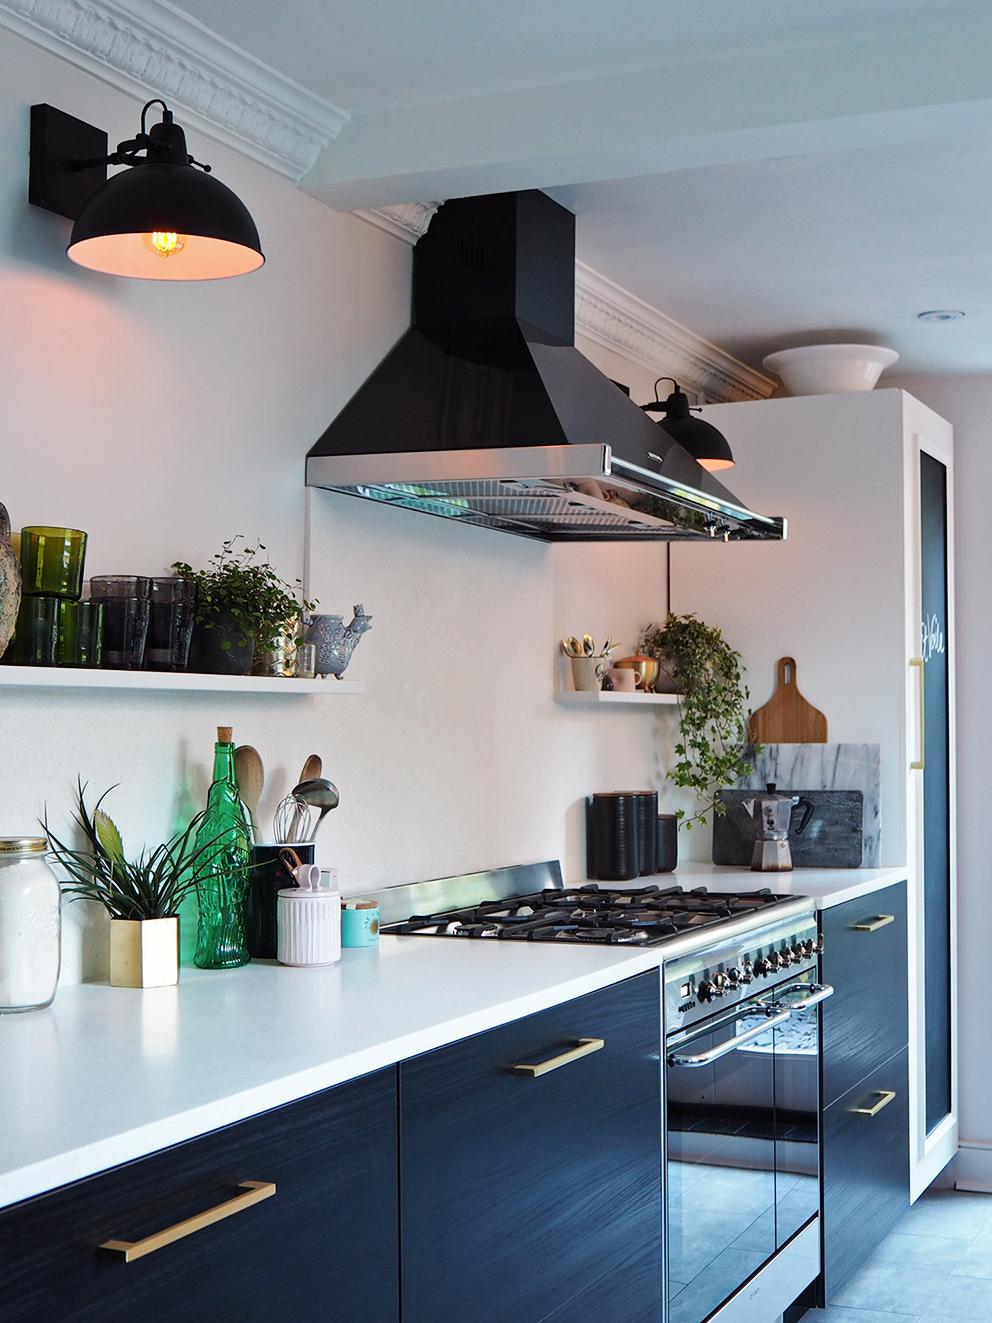 French For Pineapple Blog - Full Kitchen Source List